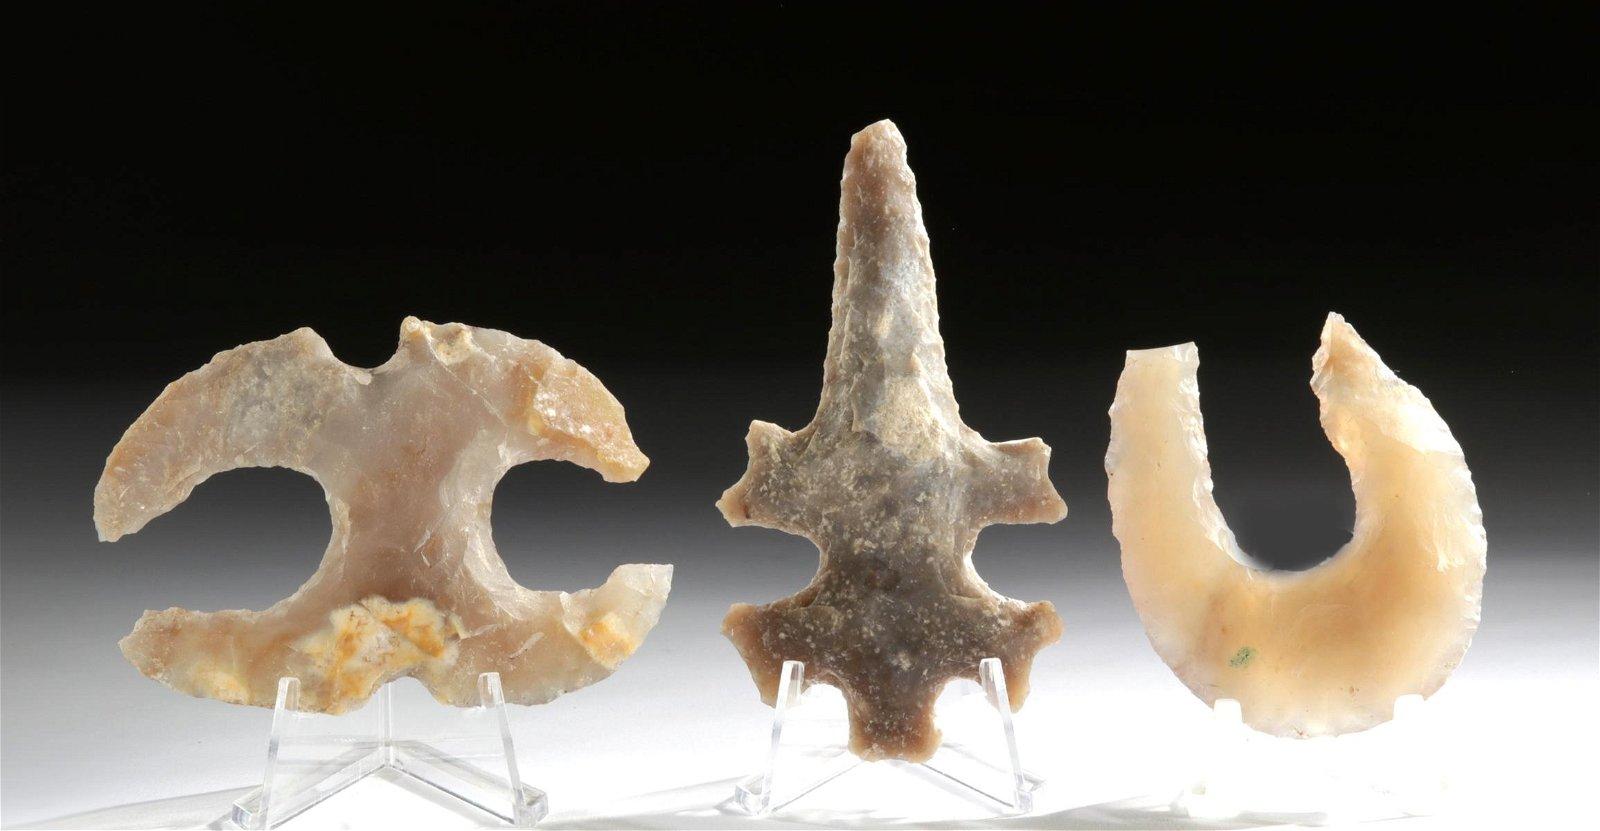 Lot of 3 Maya Eccentric Flints - Lizard & Other Shapes